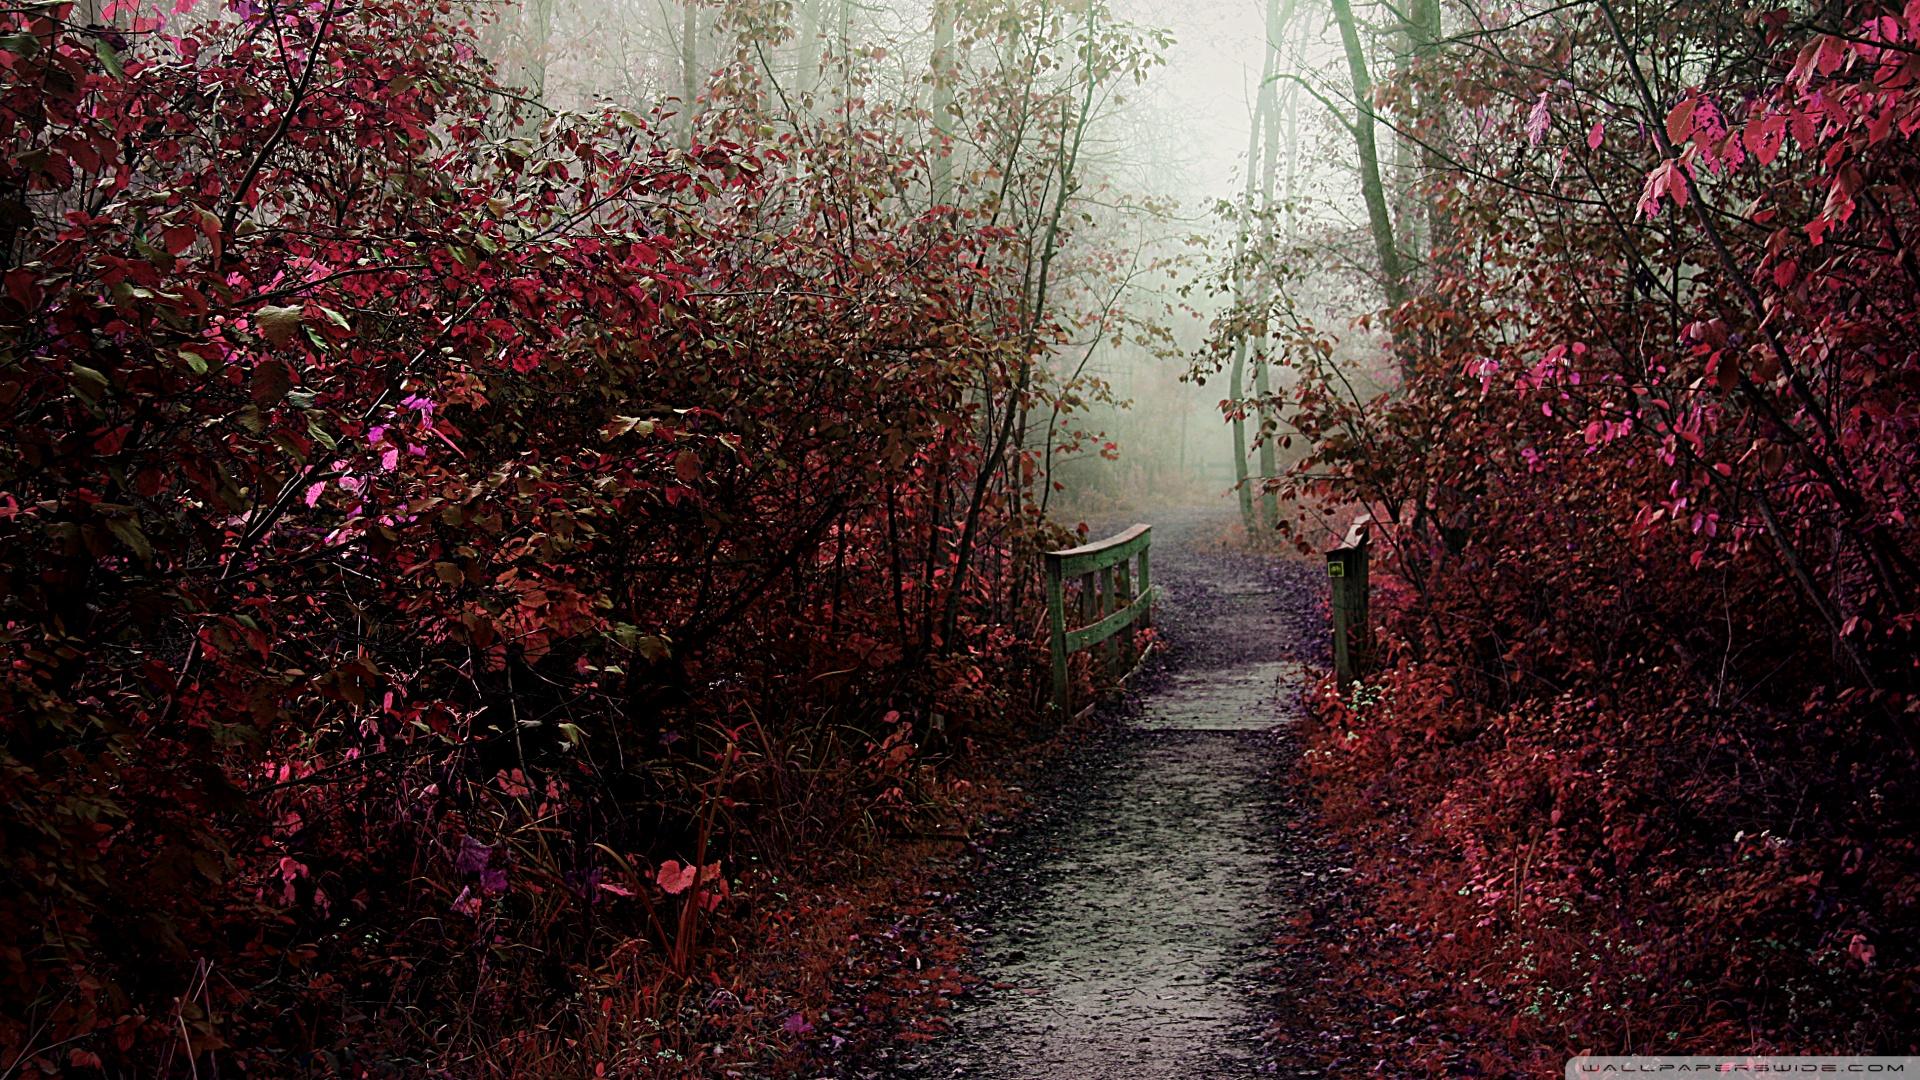 autumn_mist_path-wallpaper-1920x1080